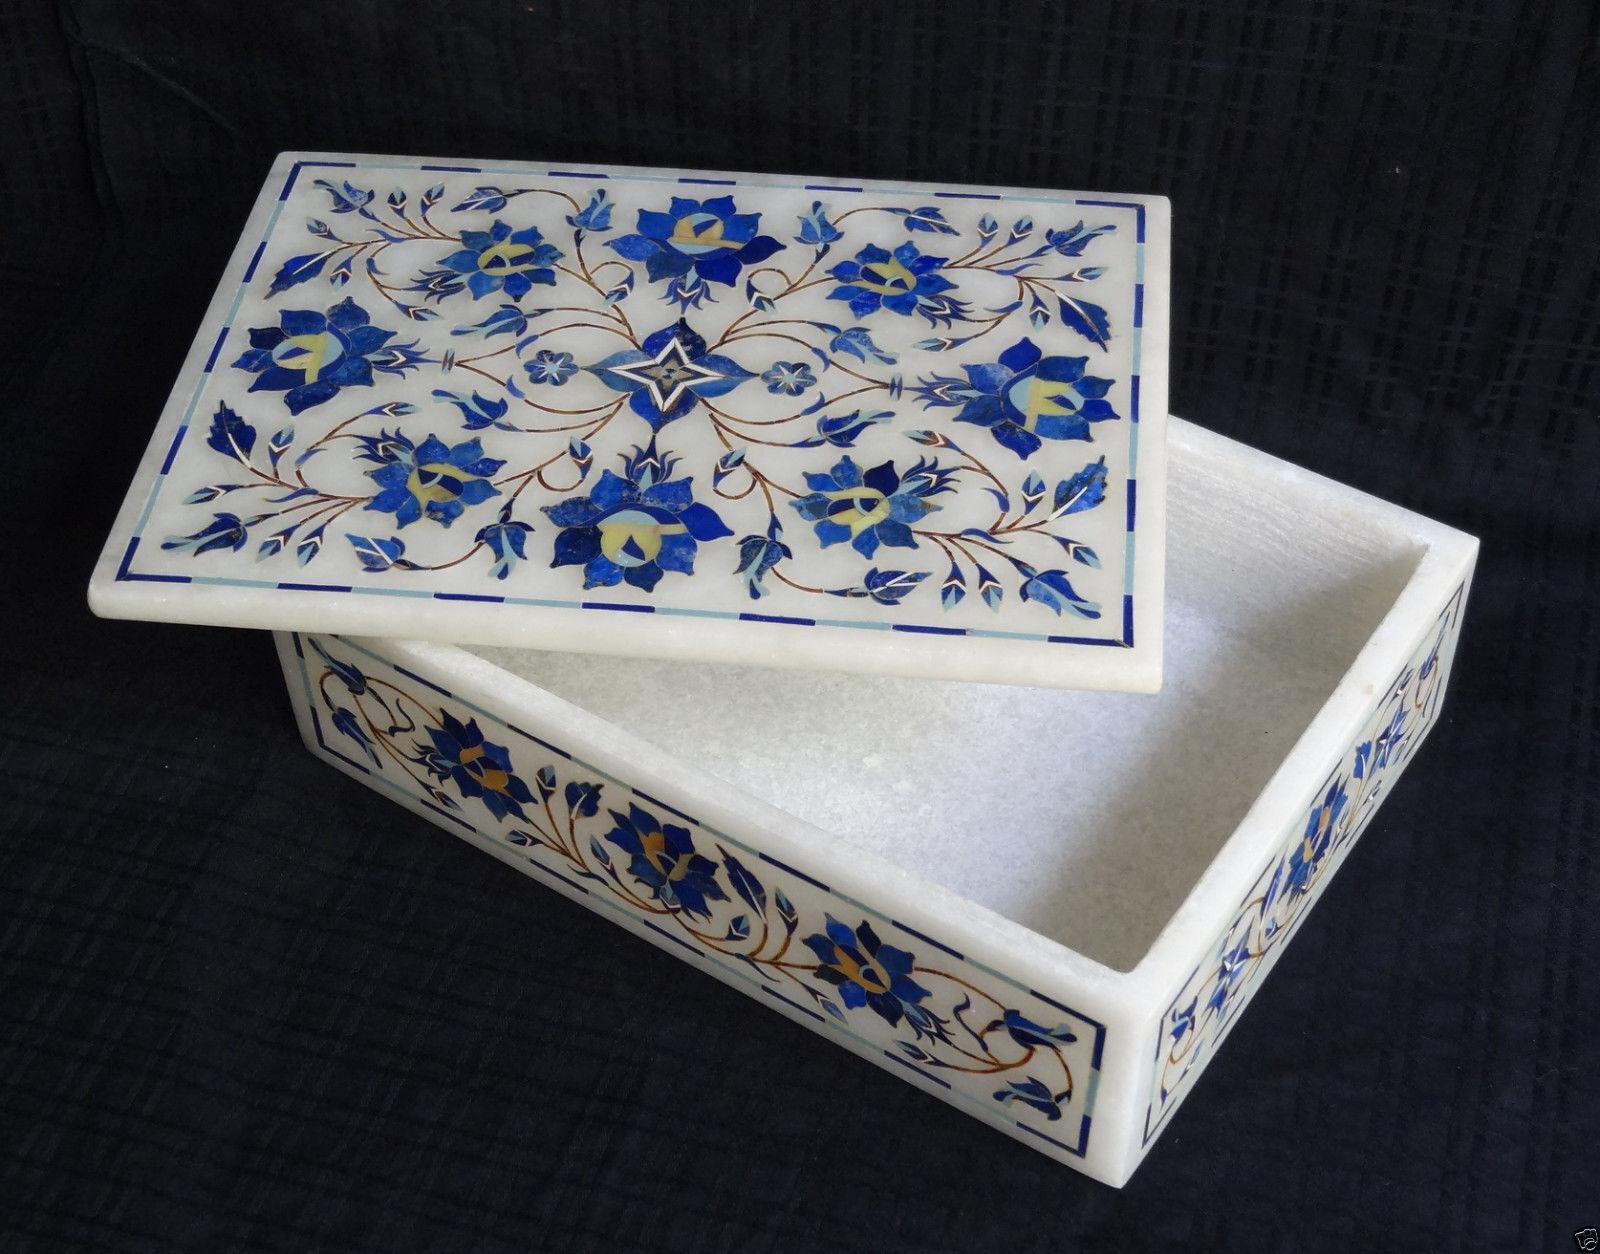 7 x5 x2  Marble Jewelry Box Rare Lapis Stone Mosaic Floral Home Decor